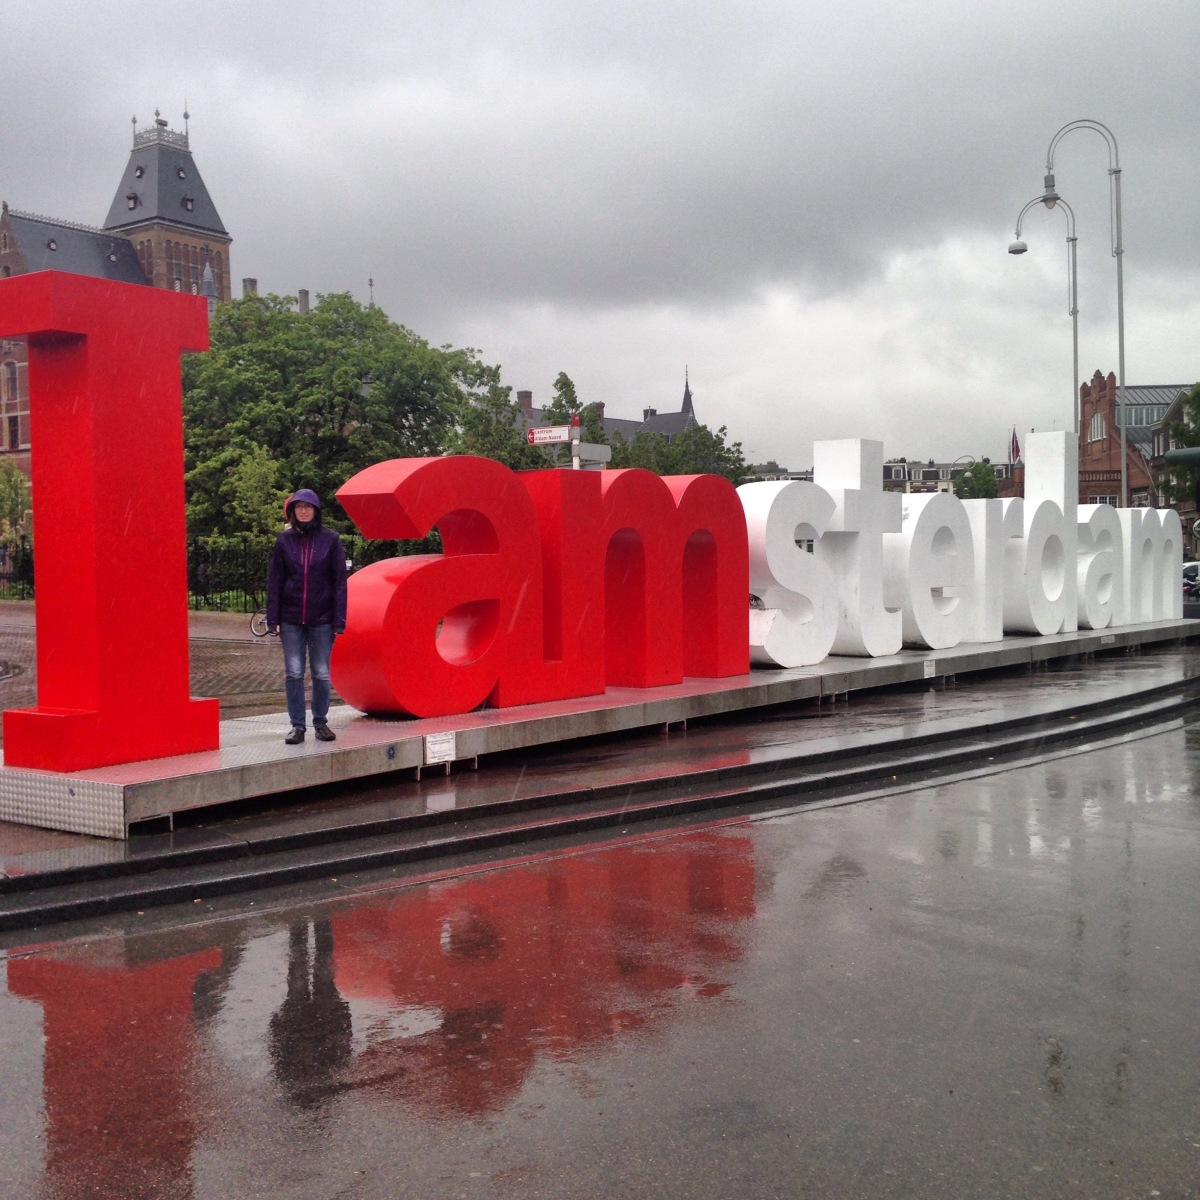 Hup Amsterdam!